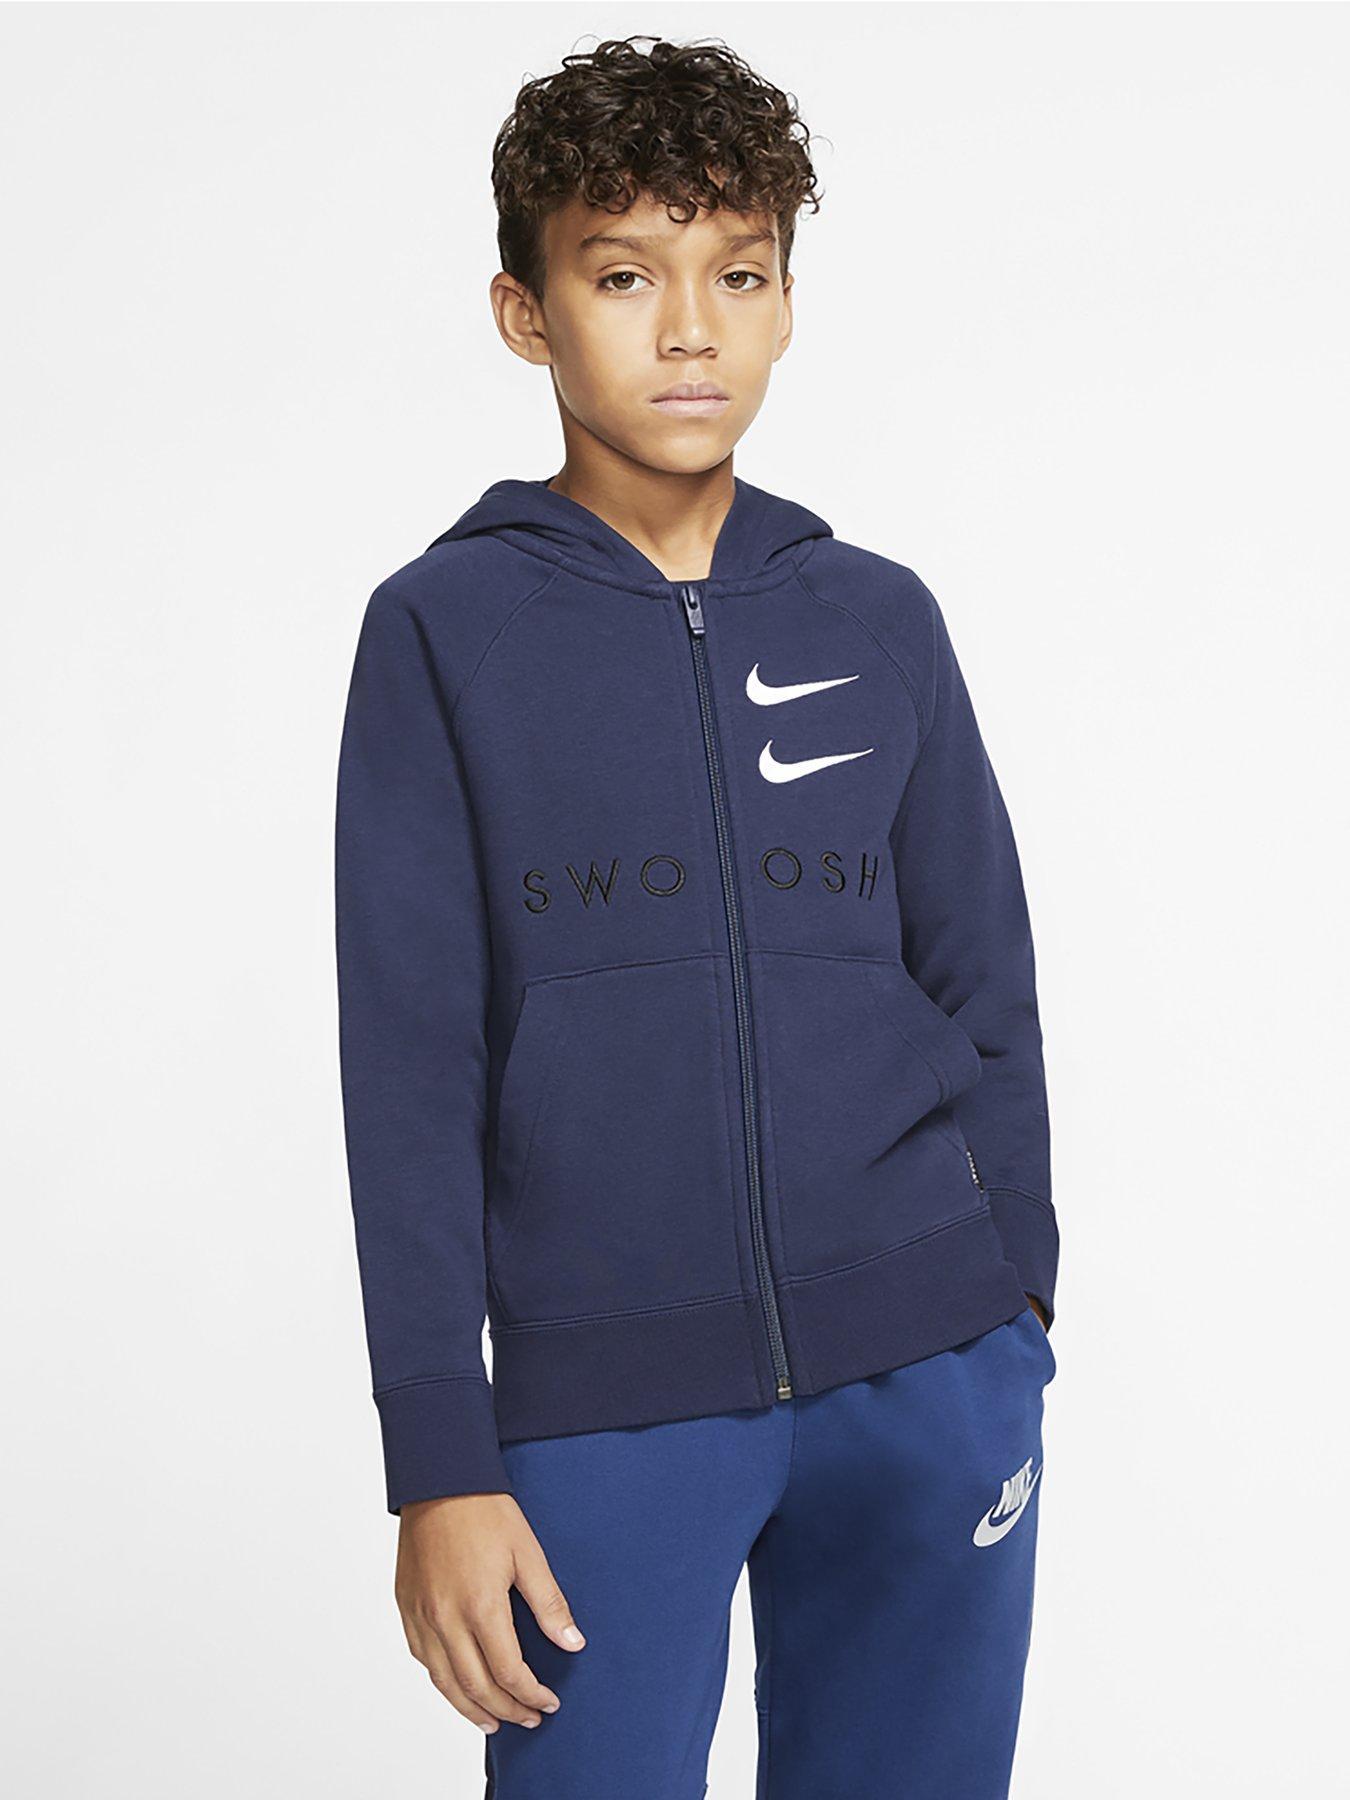 Adidas Boys Junior Kids Full Fleece Hoodie Age 5-16 Core 18 Black Red Navy Gray